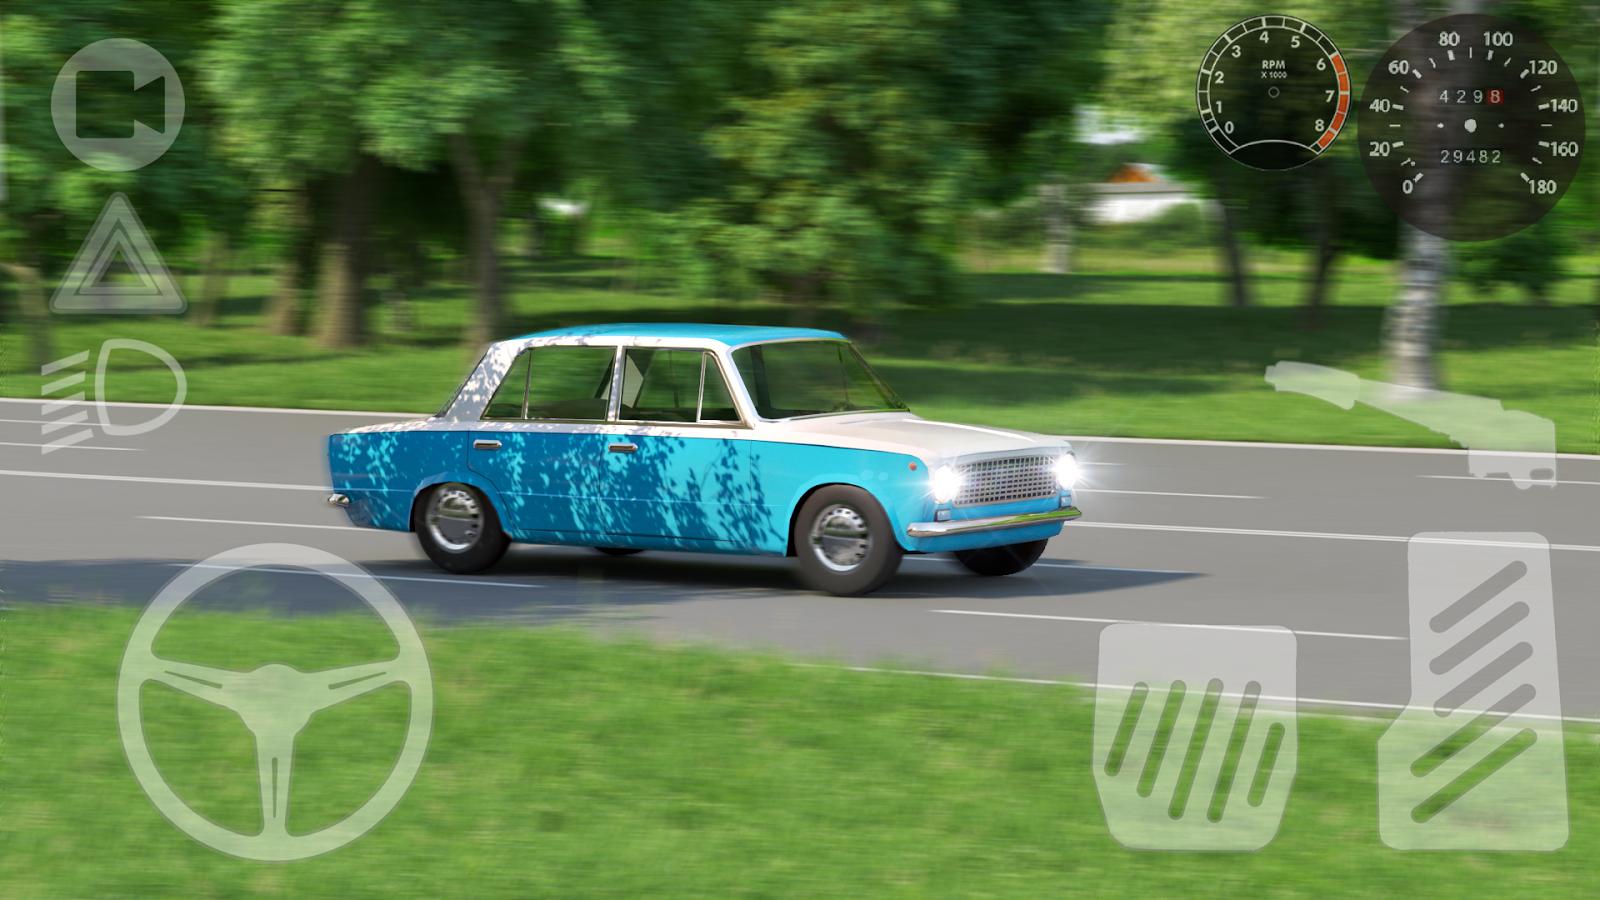 Best Car Driving Simulator Apps